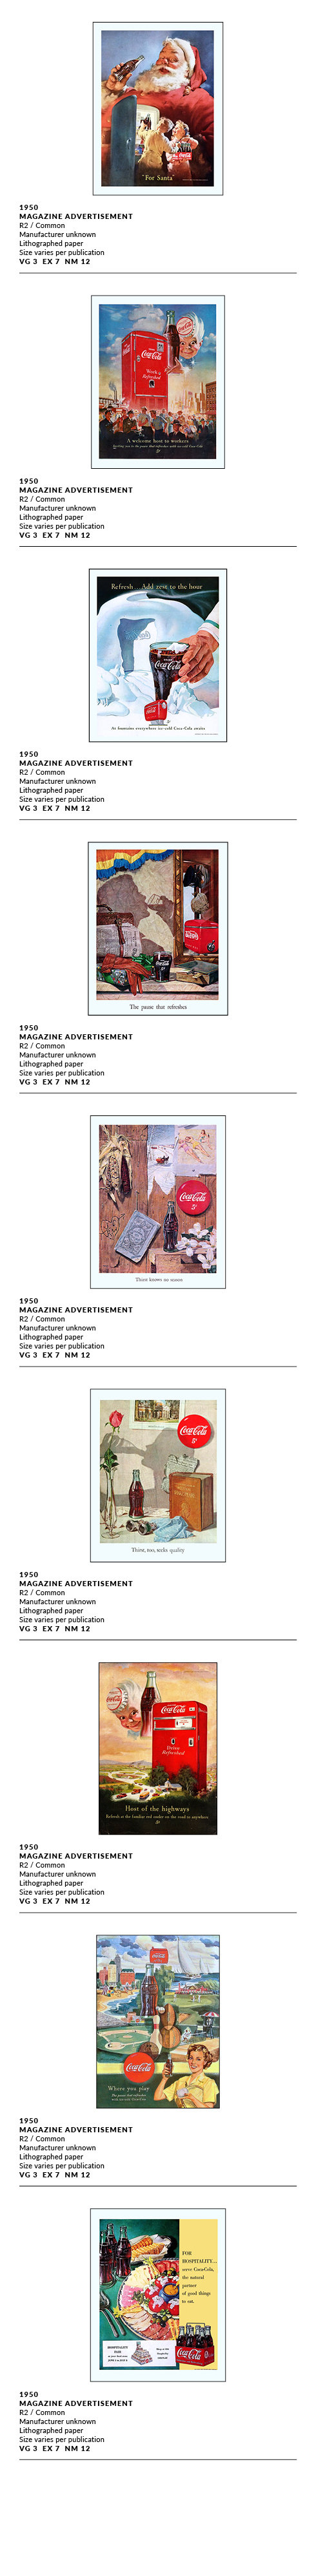 1950-54 Ads2.jpg